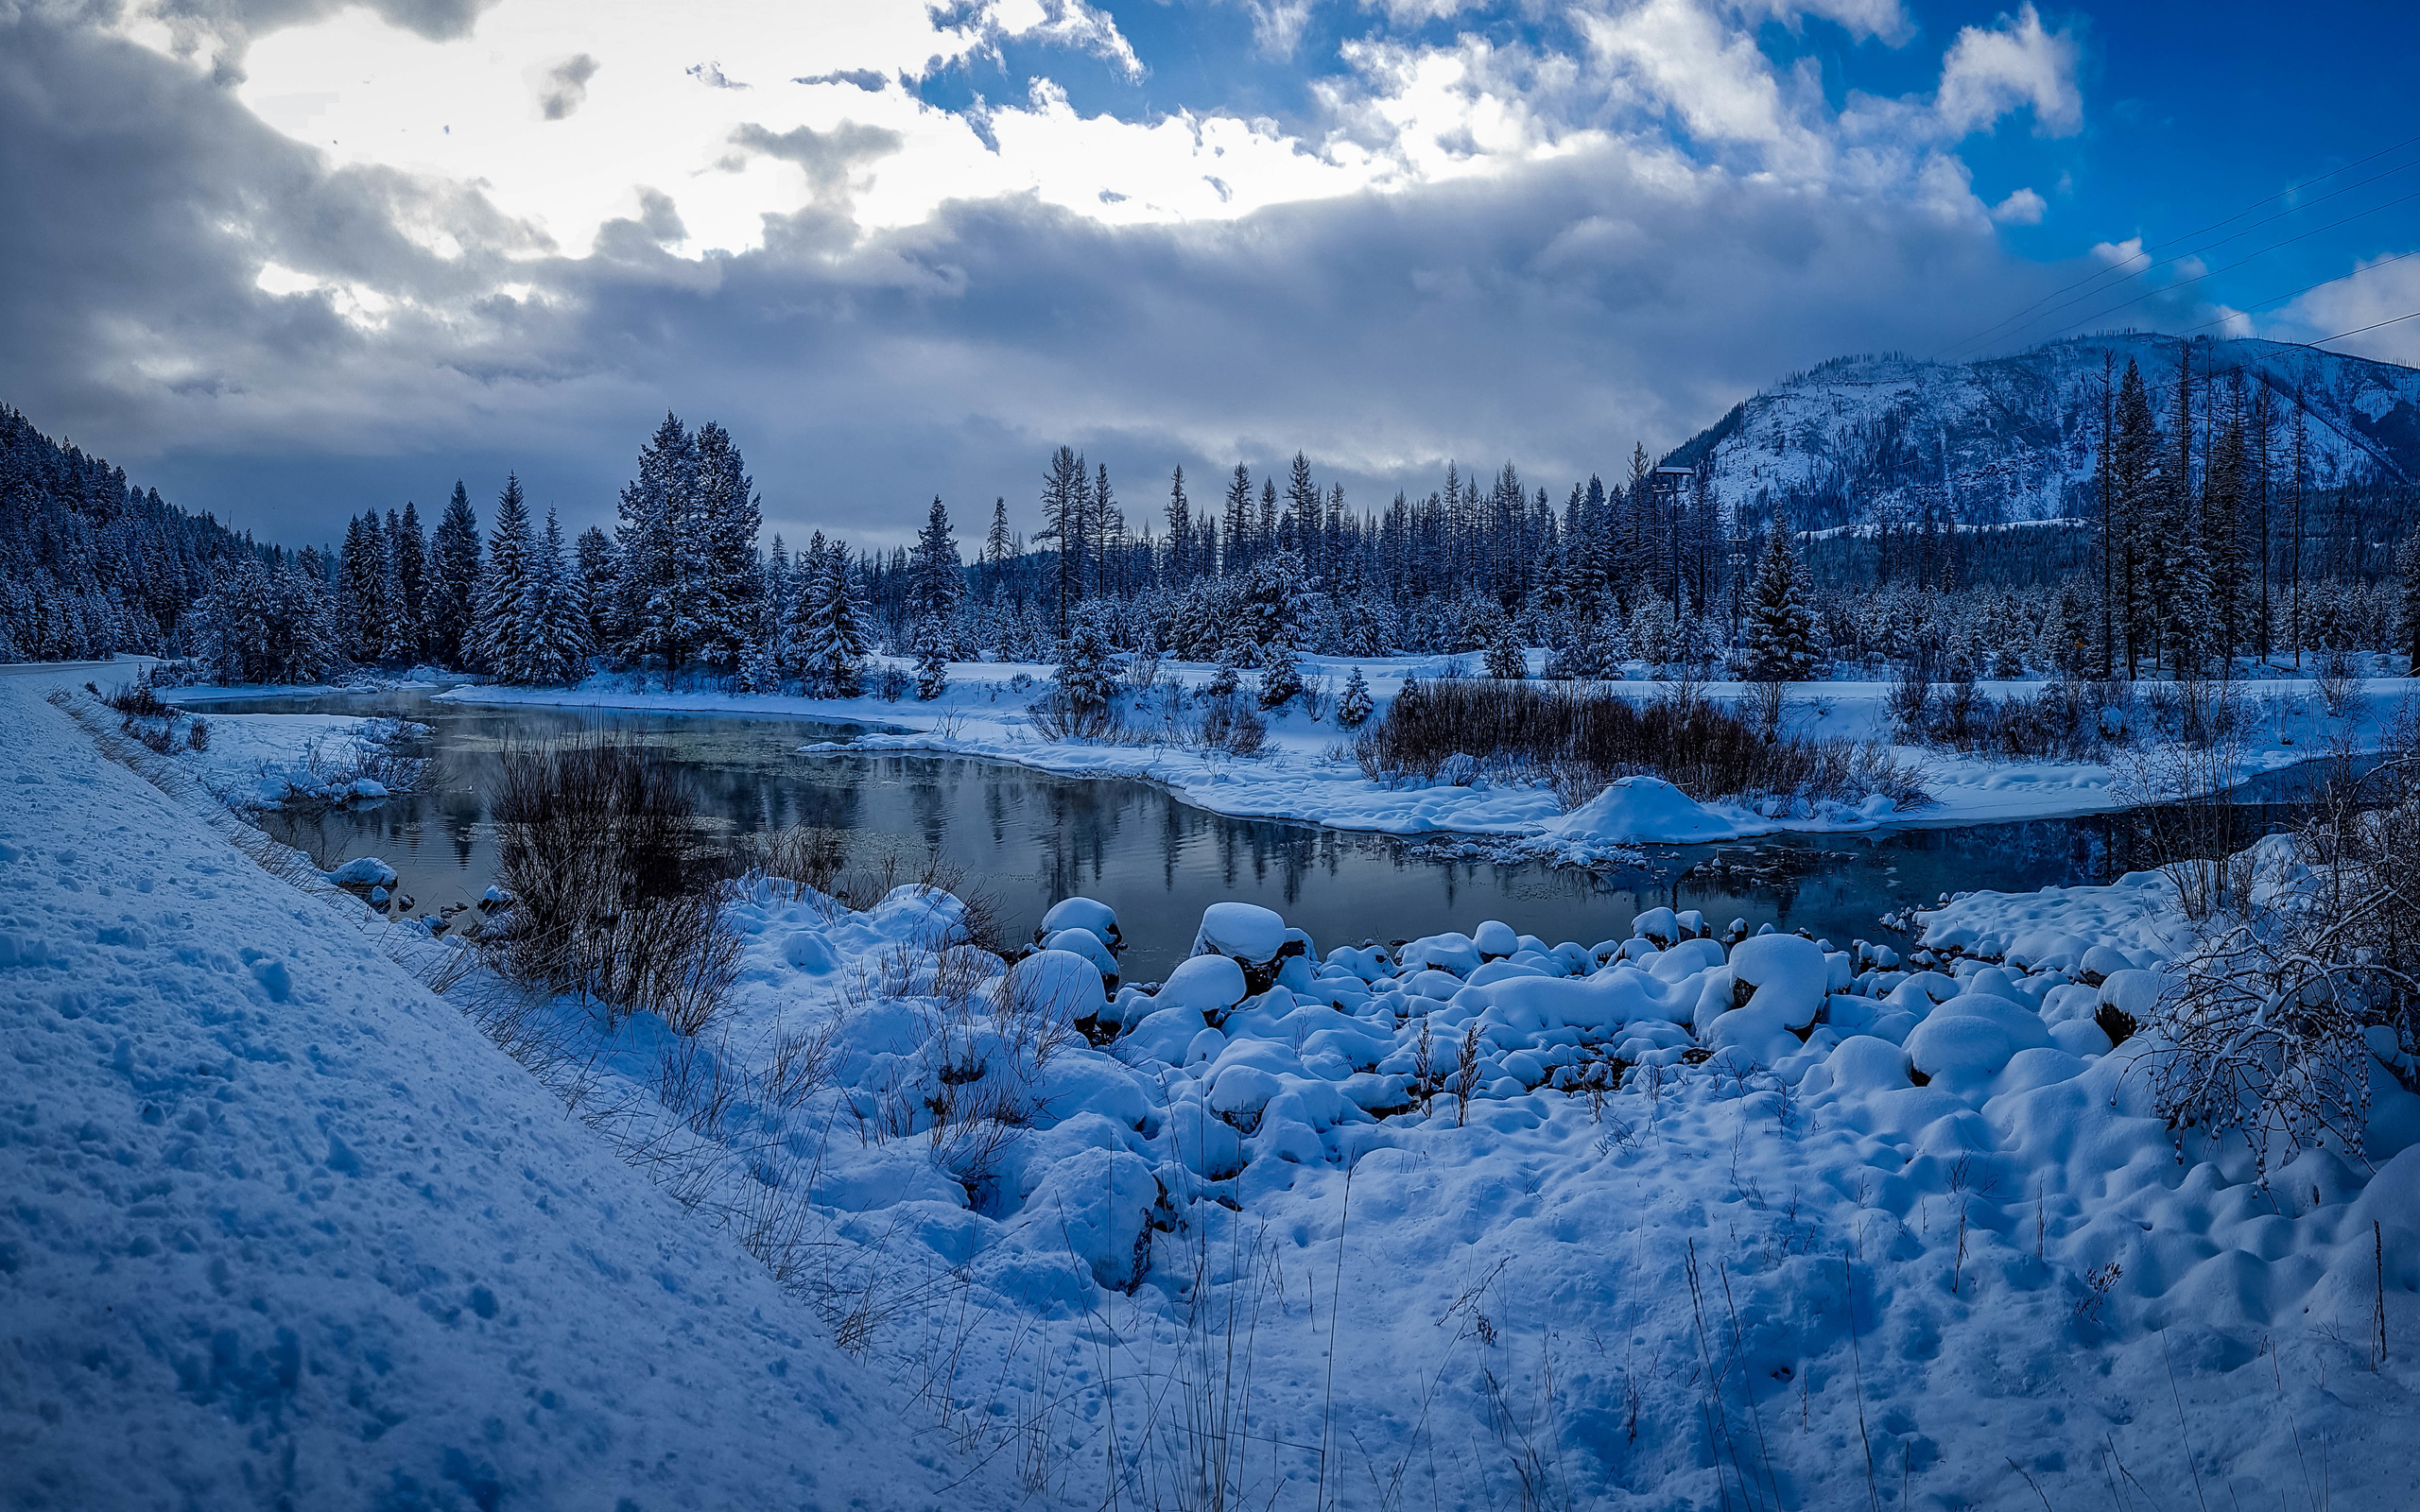 вечер, вода, небо, природа, река, зима, снег